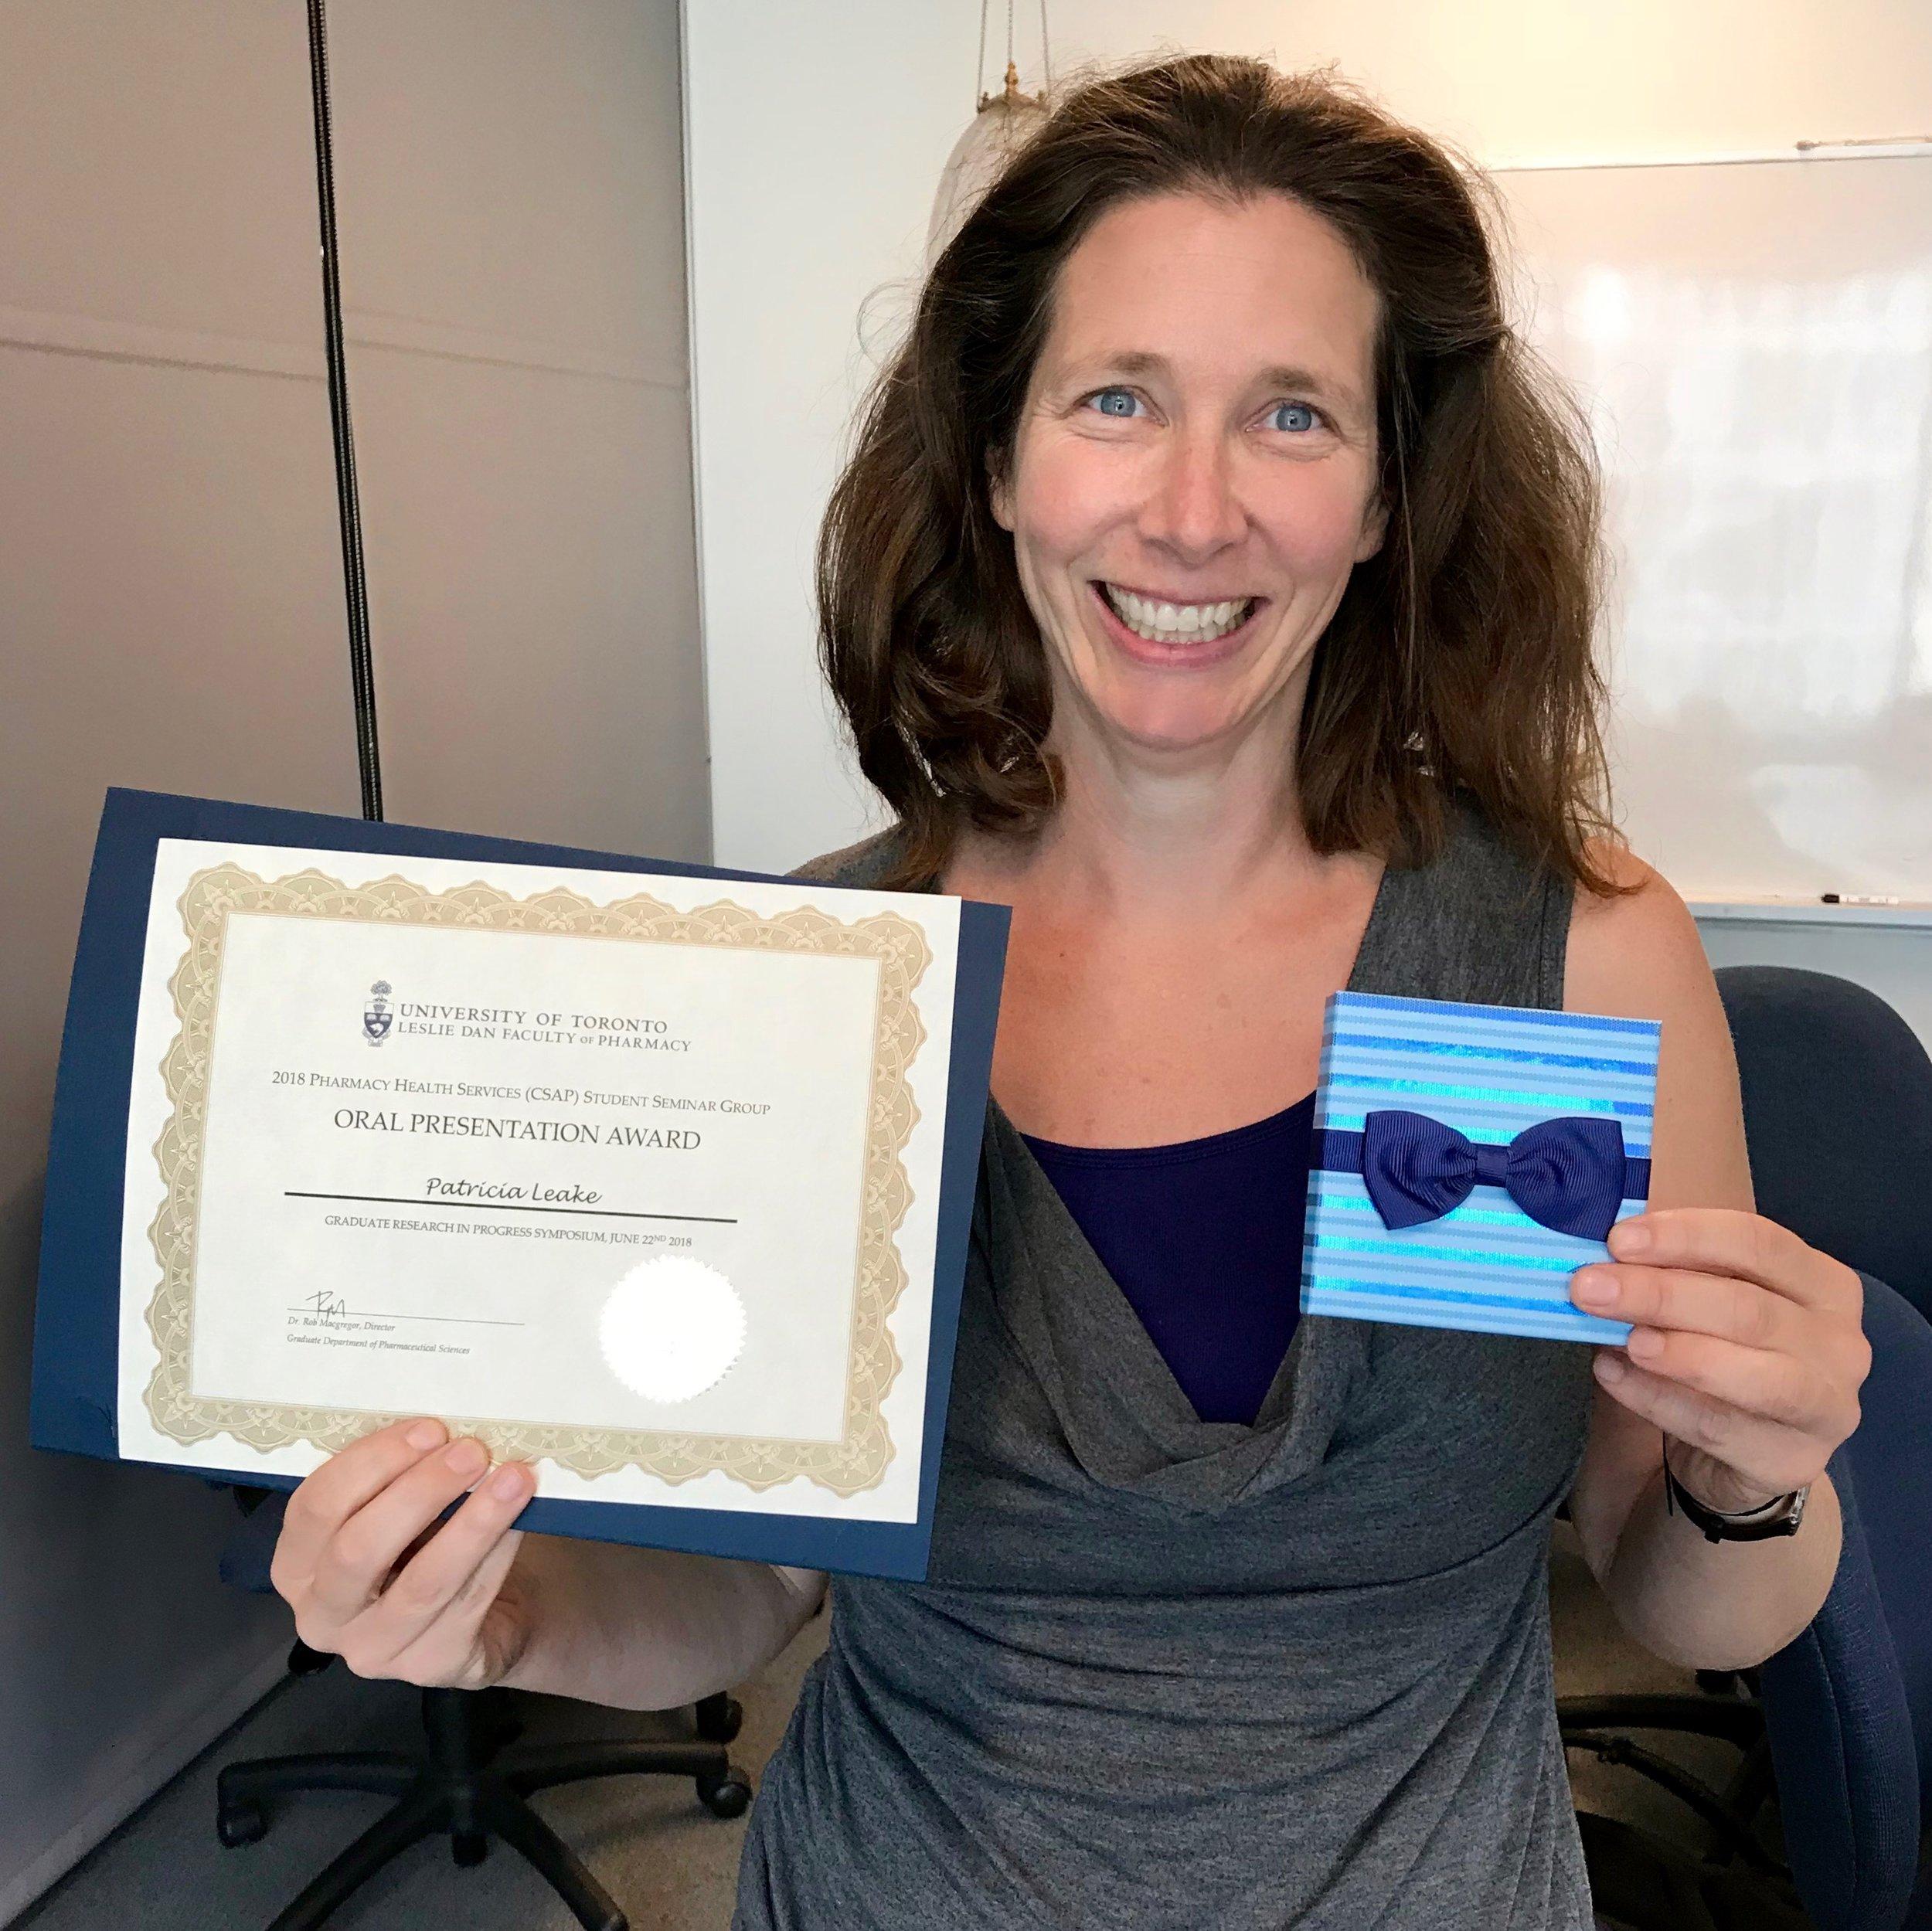 Patti Leake celebrates her best presentation award.